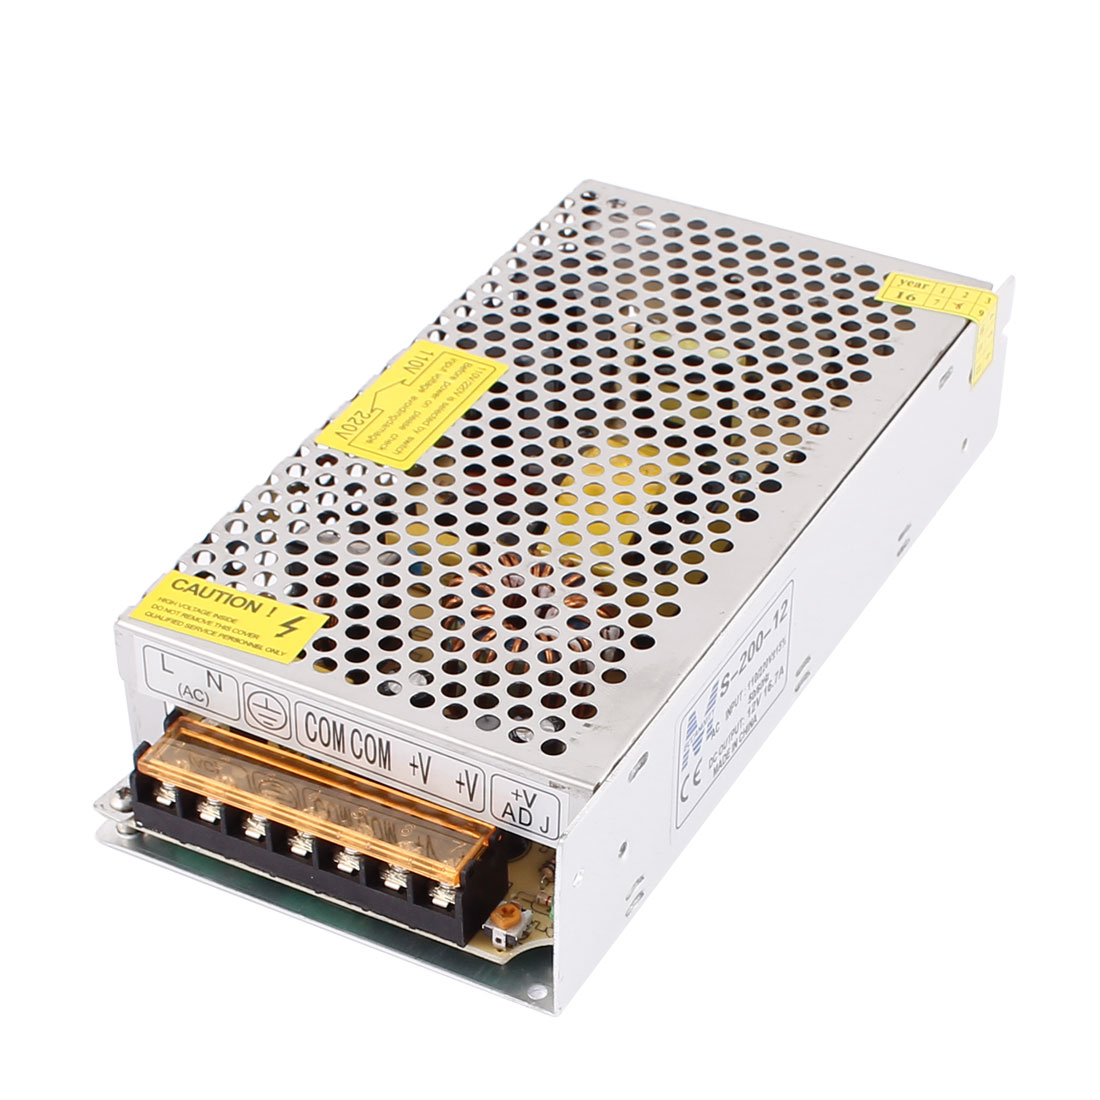 AC 110V/220V to DC 12V 16.7A 200W Switch Power Supply Driver S-200-12 for LED Strip Light